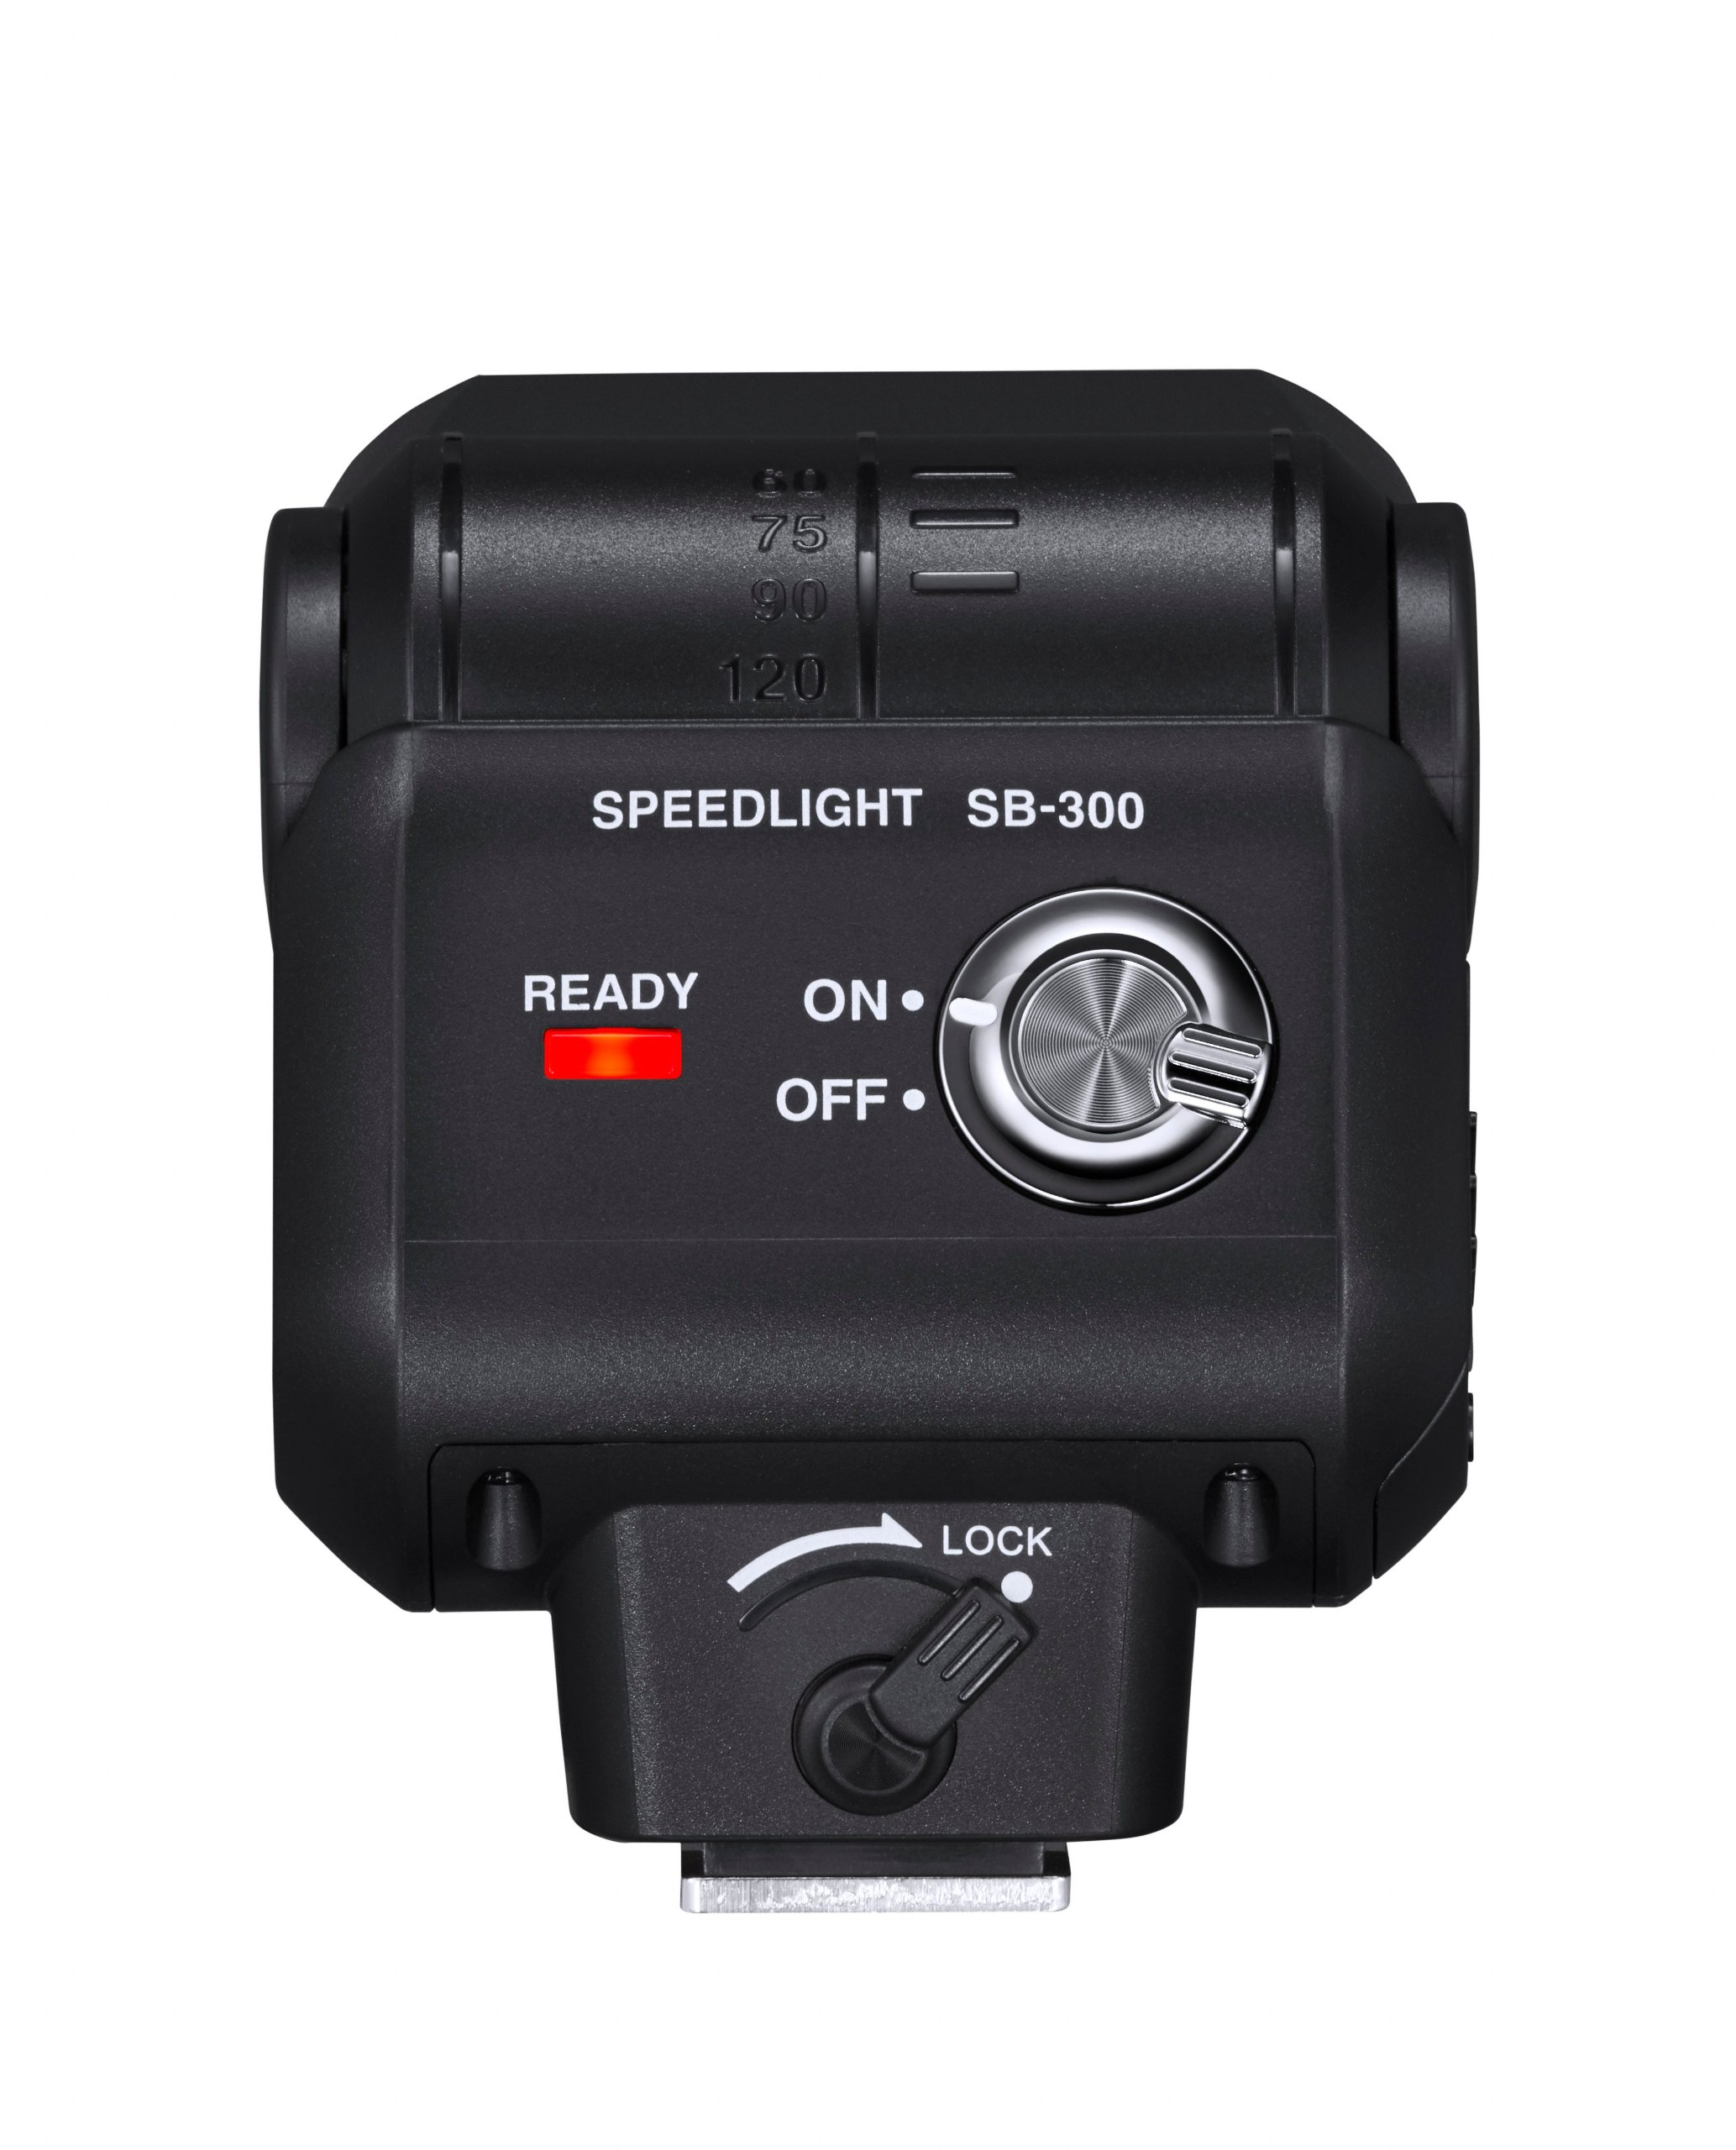 Nikon SB-300 AF Speedlight Flash for Nikon Digital SLR Cameras by Nikon